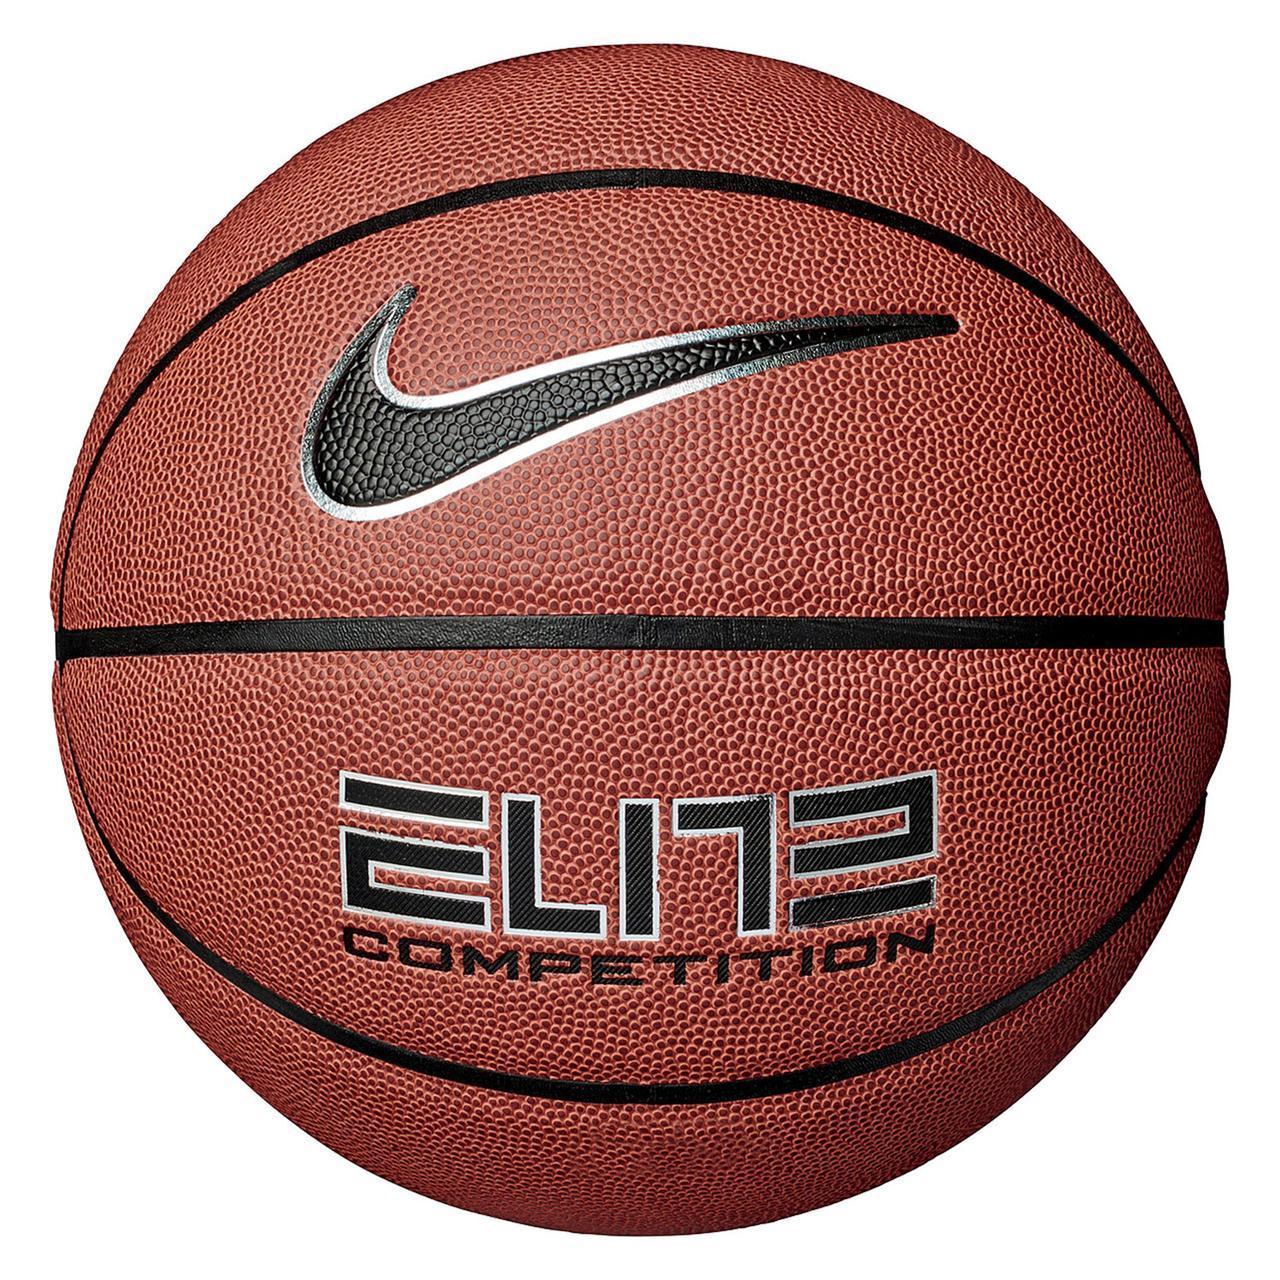 М'яч баскетбольний NIKE ELITE COMPETITION 2.0 size 7 (N. 000.2644.855.07)